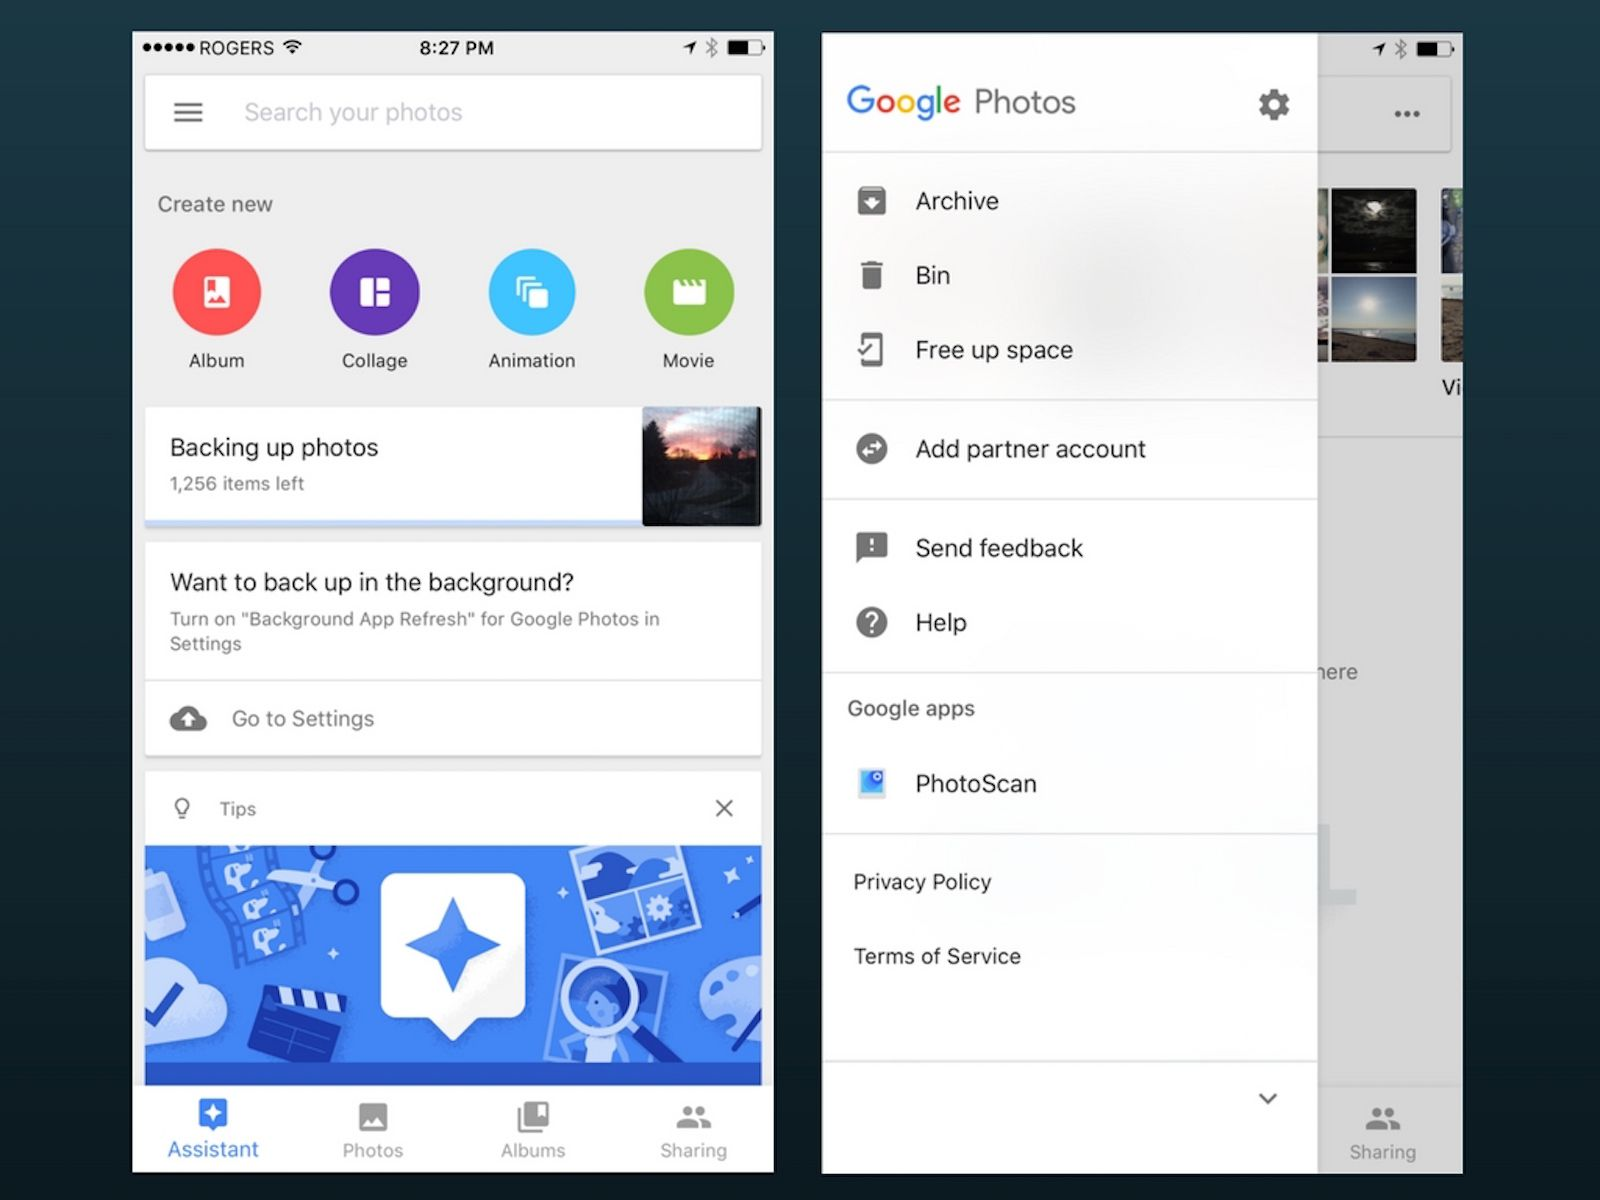 Google Photos for iOS